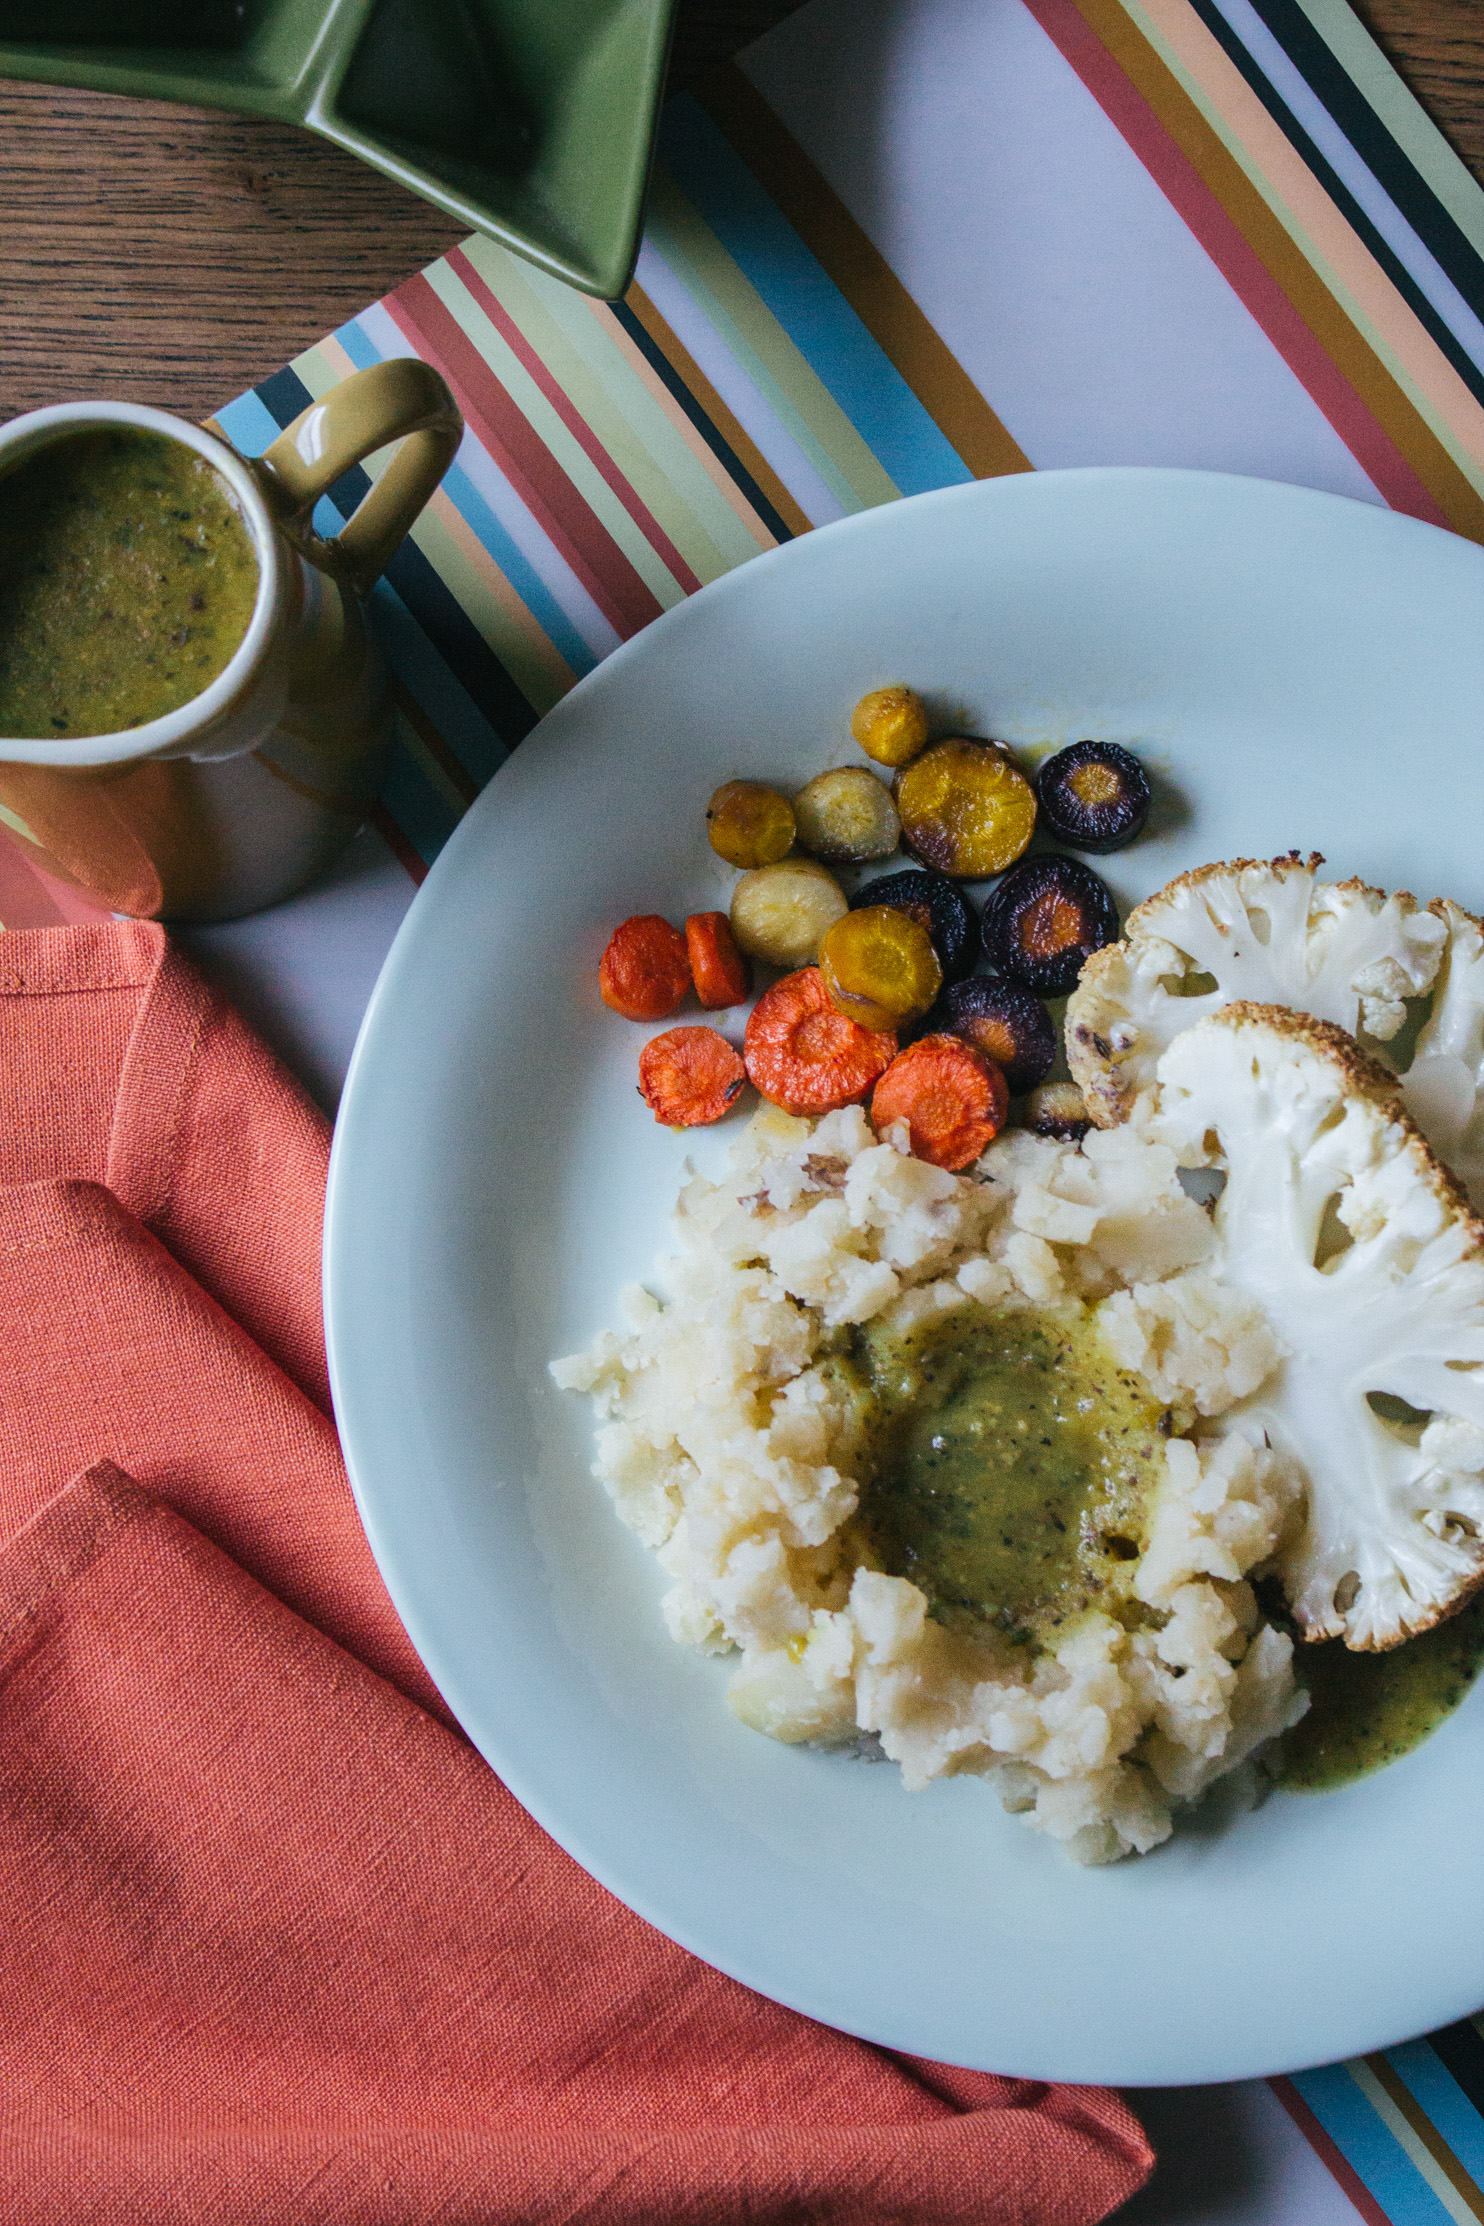 Vegan Gluten-Free Sage Gravy #vegan #dairy-free #sauce #gravy #plant-based